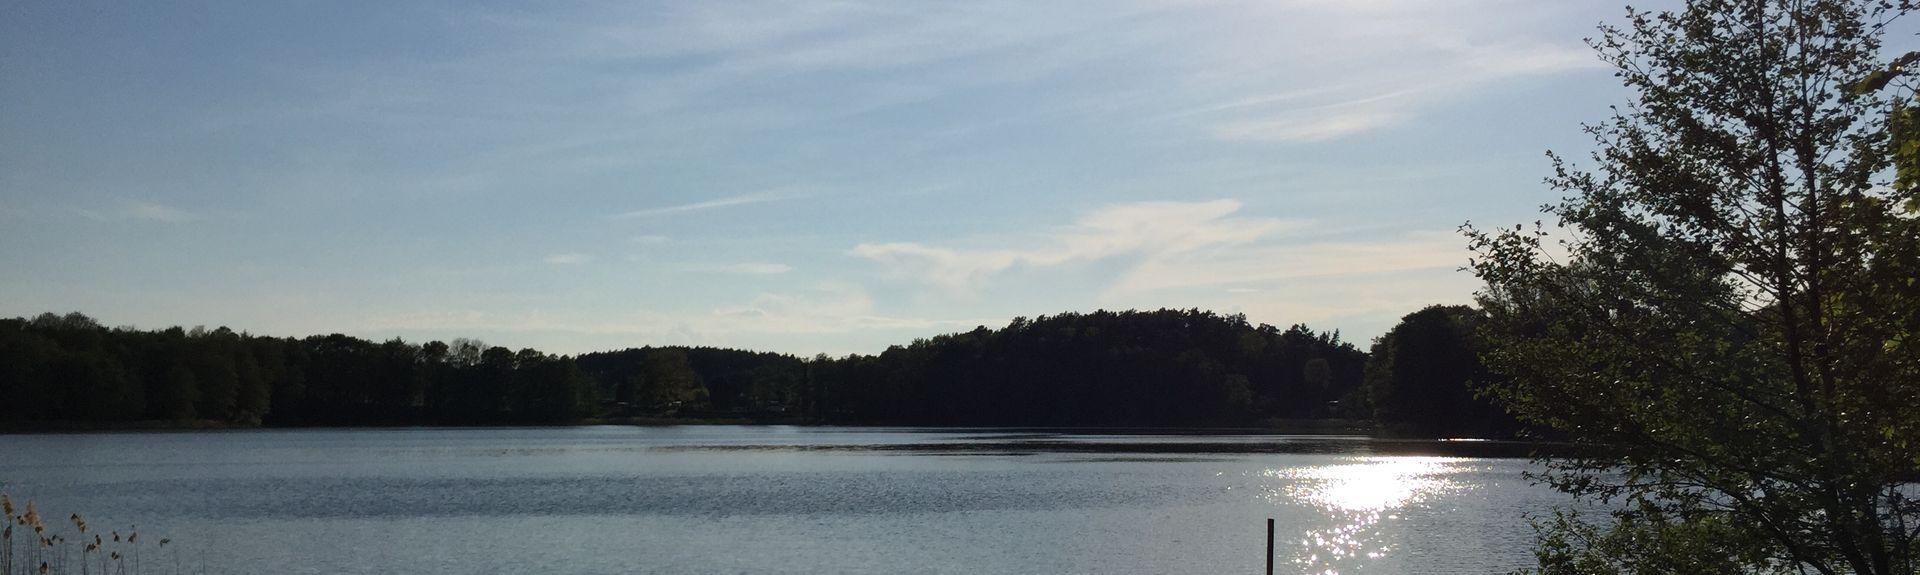 Sternberger Seenlandschaft, Germany